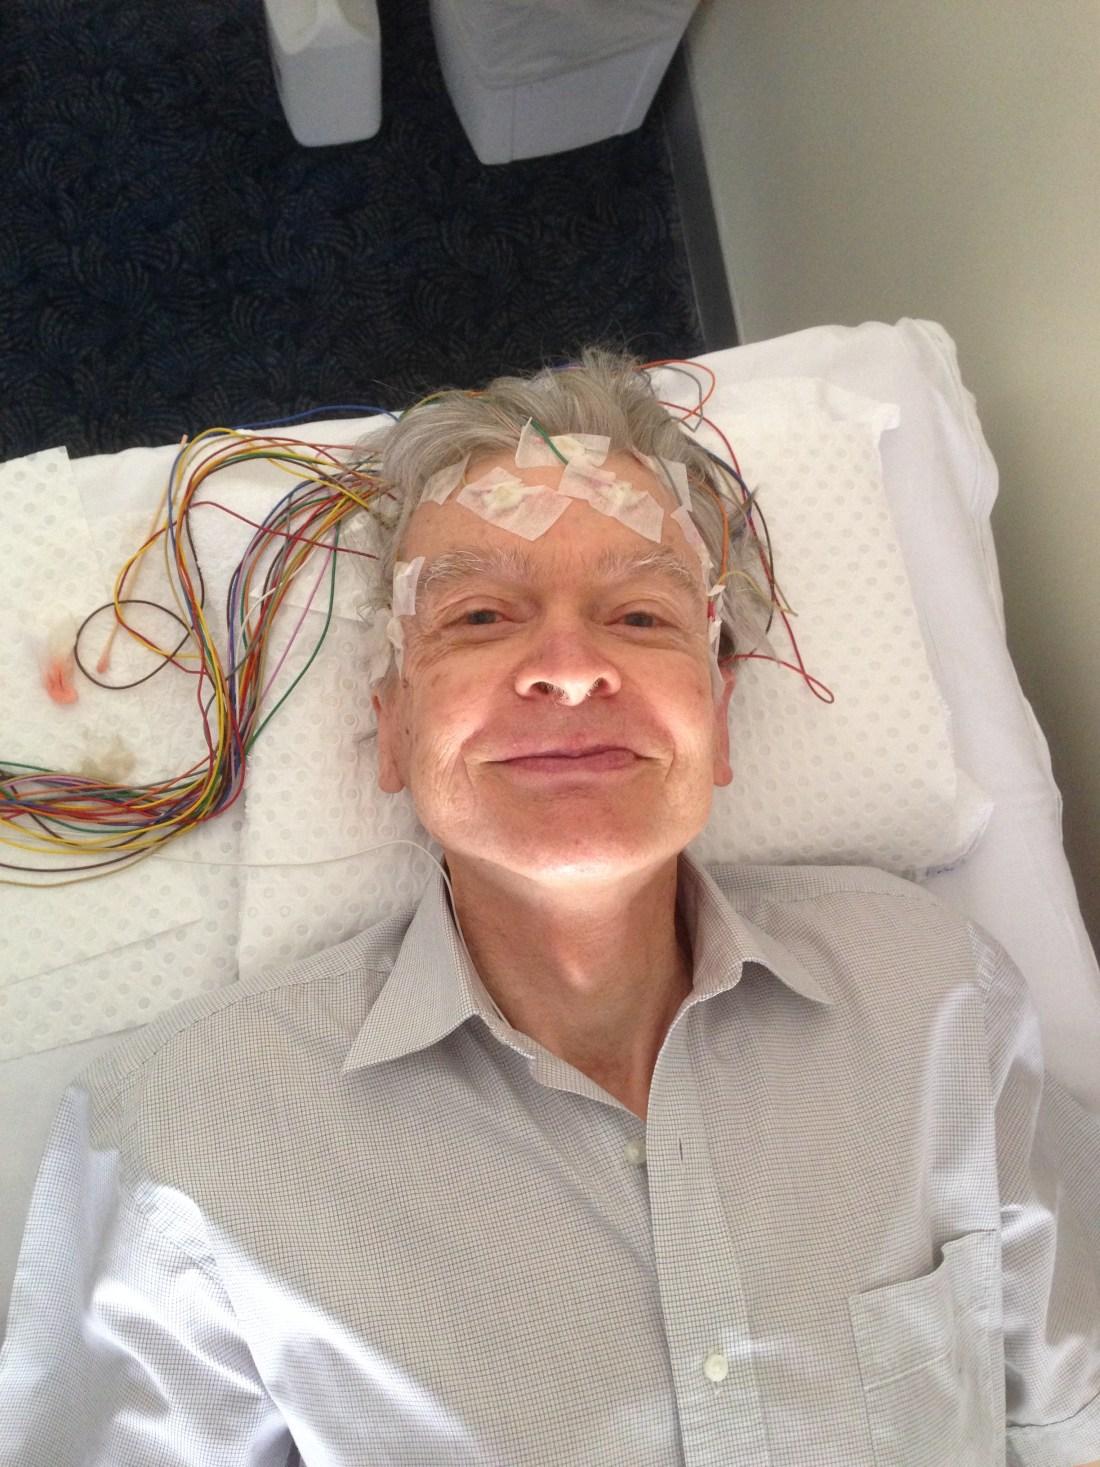 Stephen having EEG